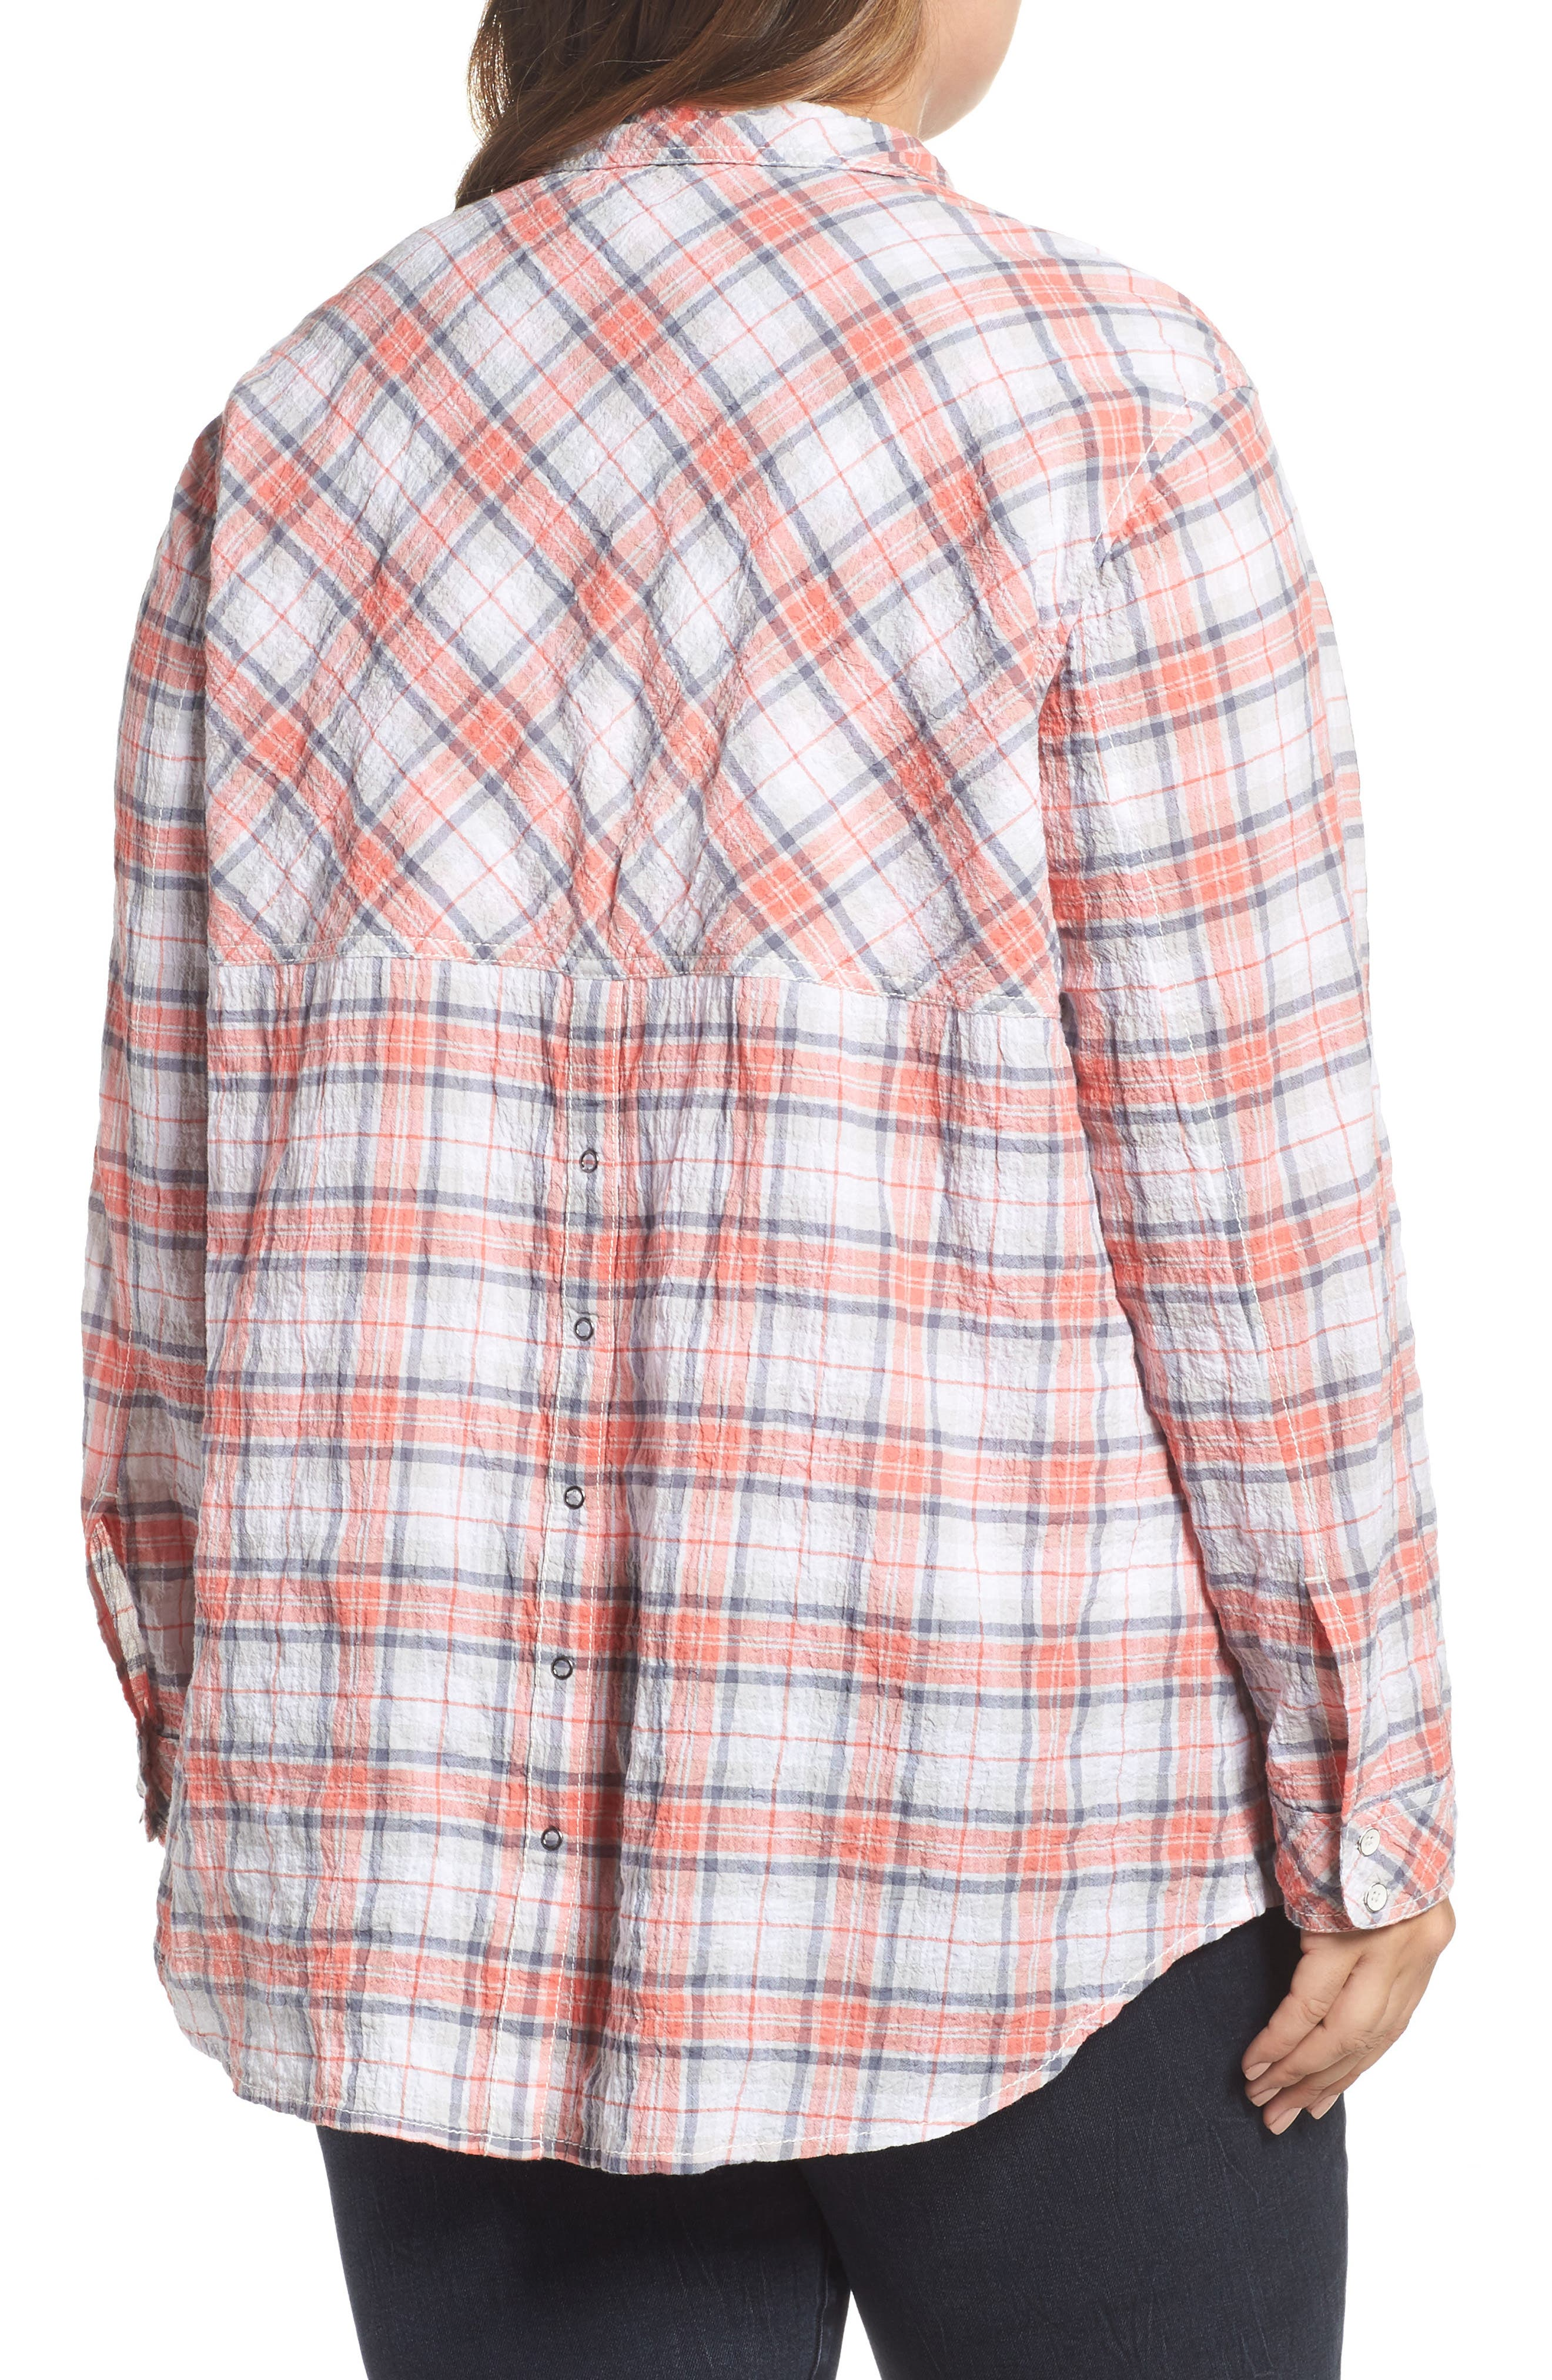 Seersucker Shirt,                             Alternate thumbnail 2, color,                             White- Coral Plaid